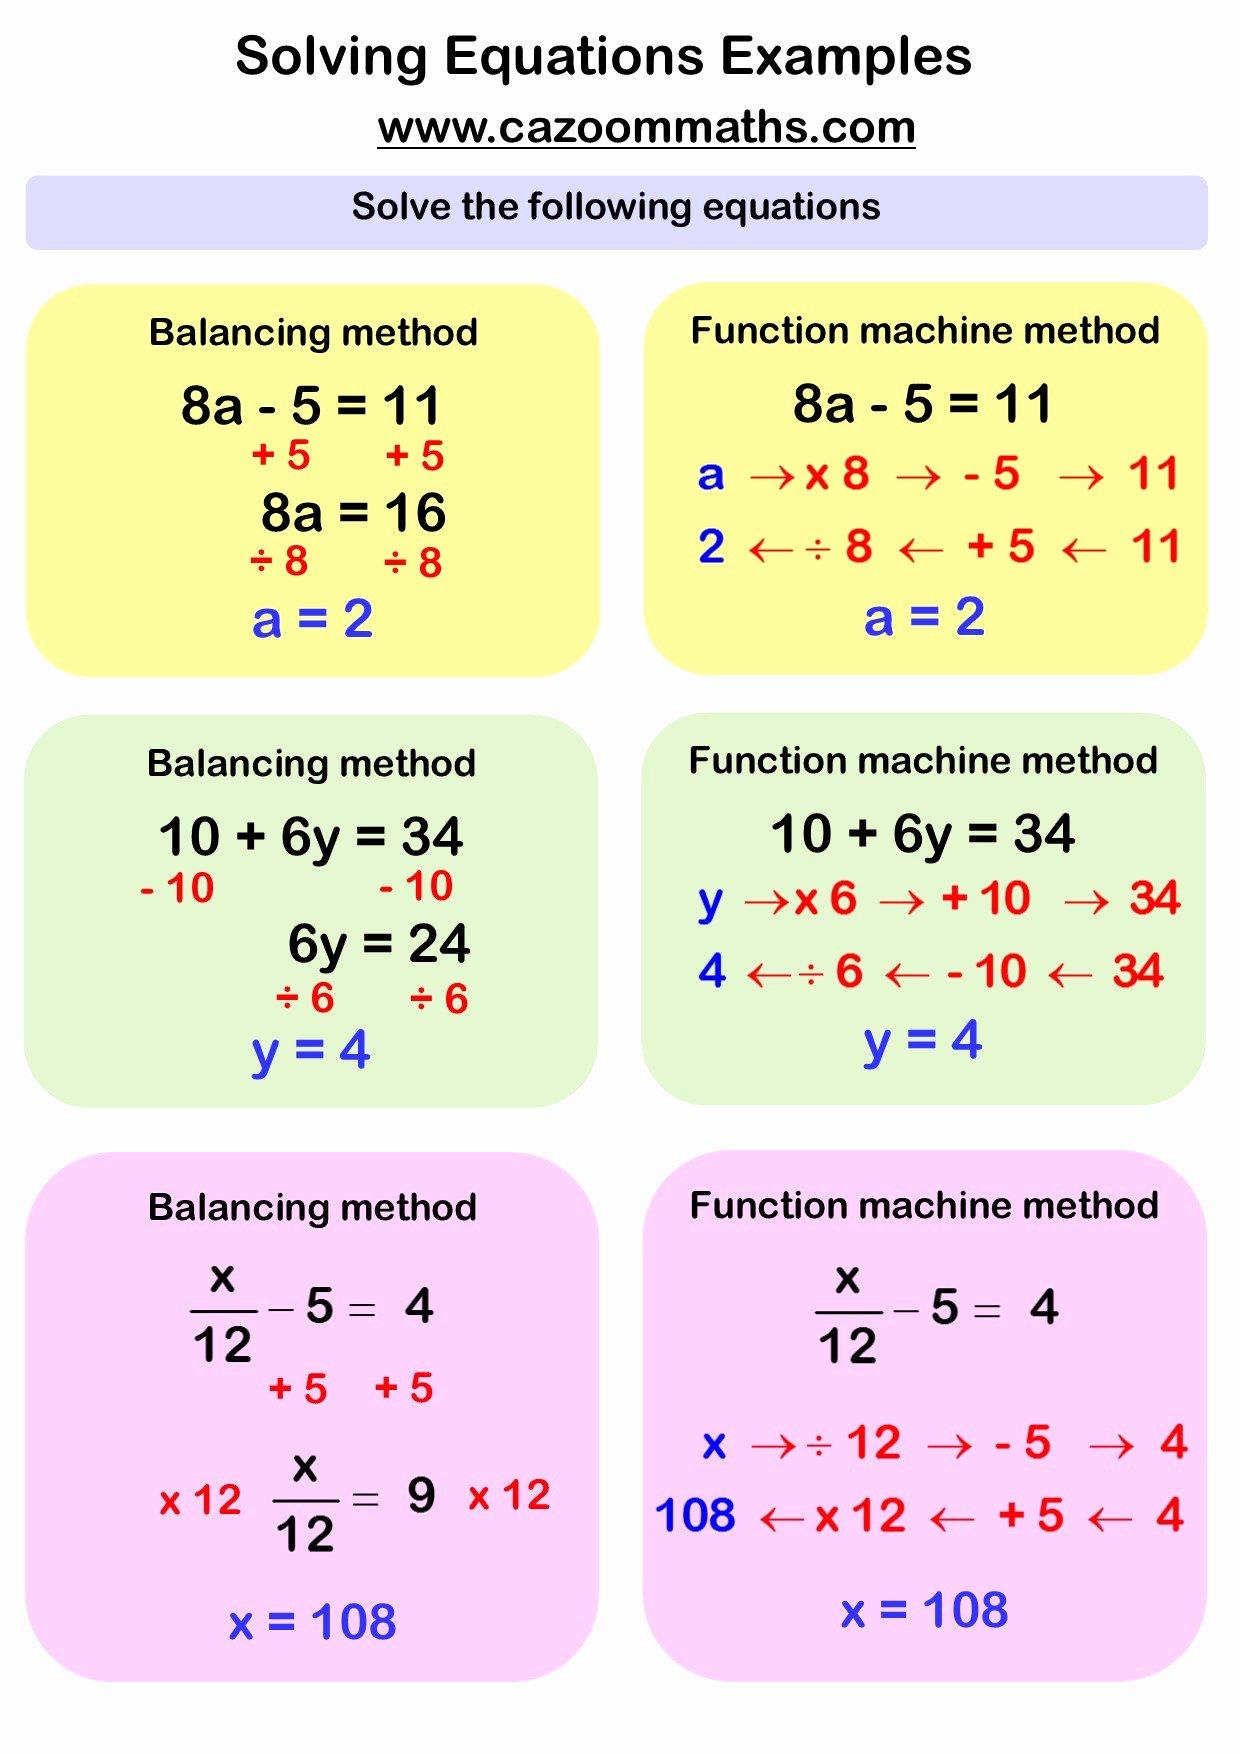 Solving Equations Worksheet Pdf New solving Linear Equations Word Problems Worksheet Pdf